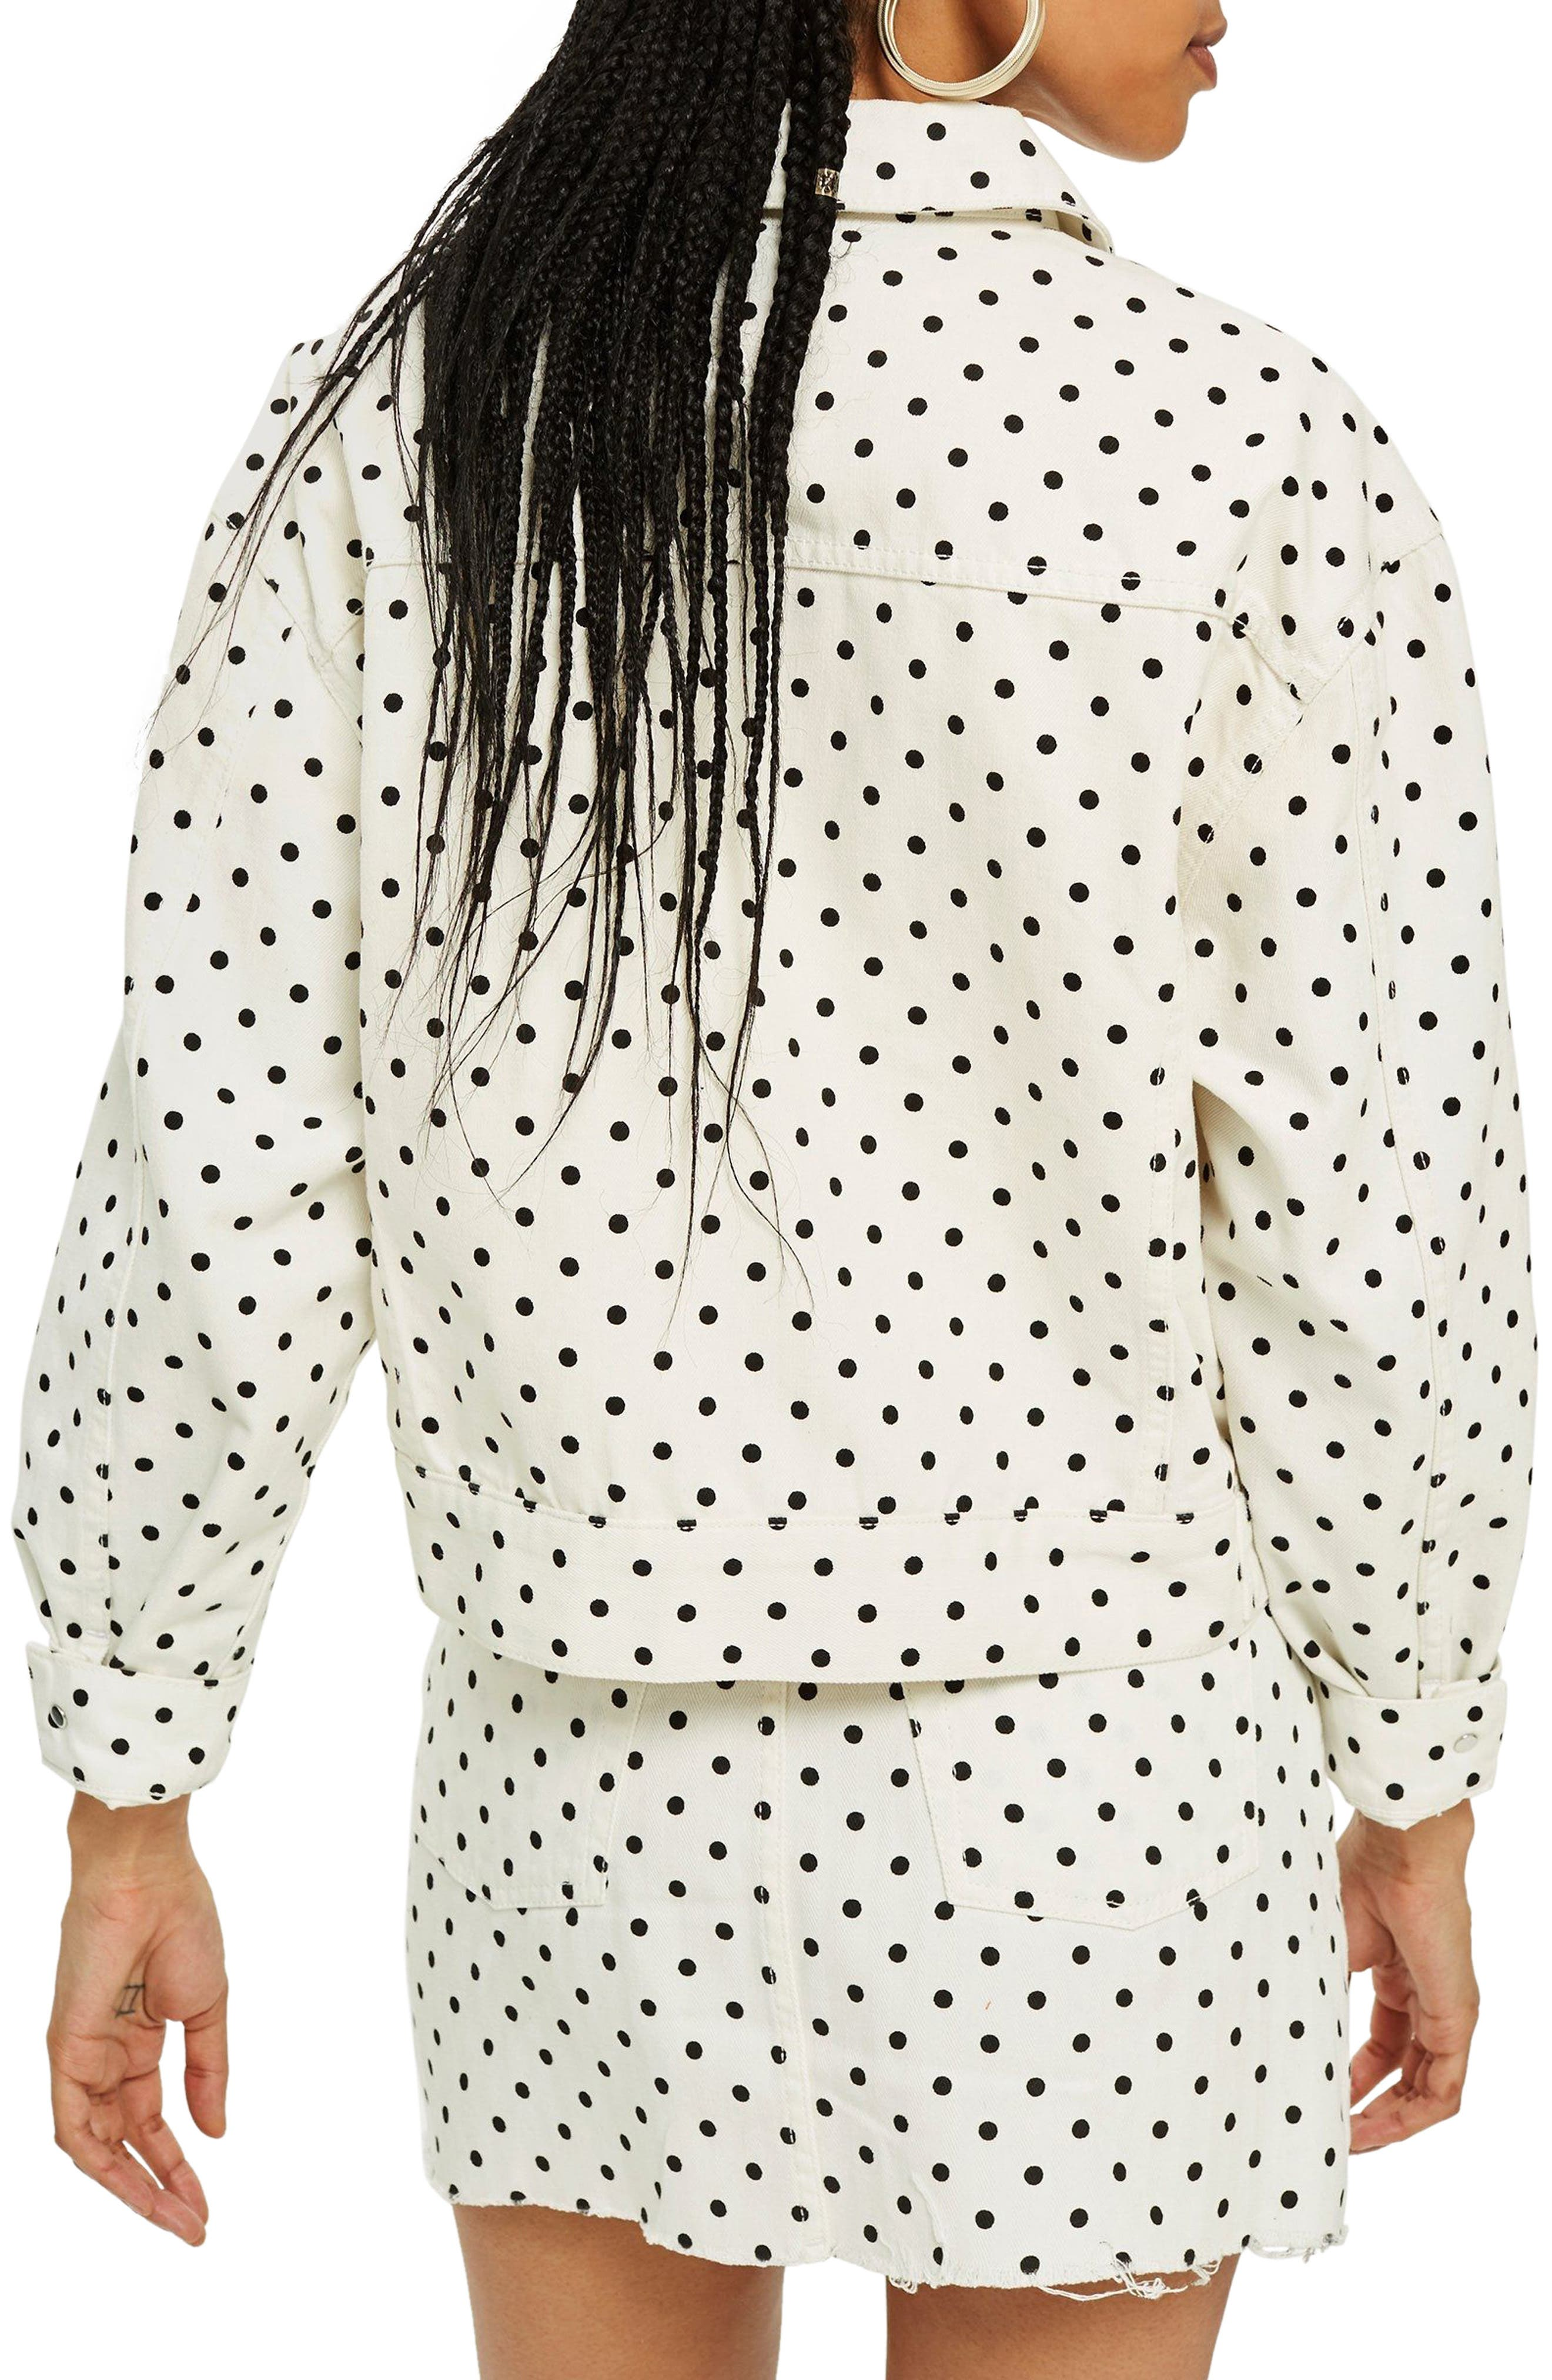 MOTO Polka Dot Crop Nonstretch Denim Jacket,                             Alternate thumbnail 2, color,